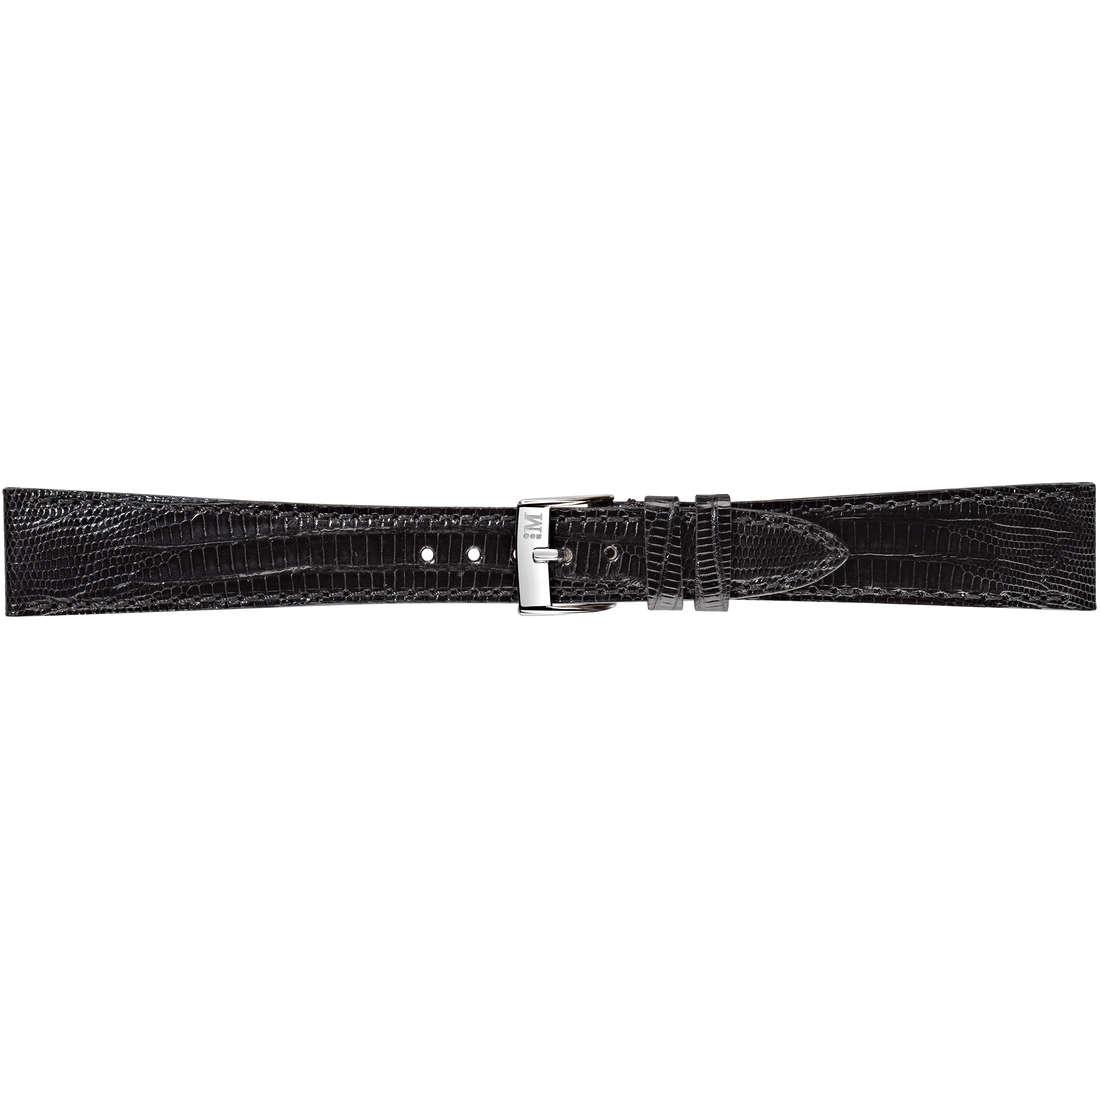 watch watch bands watch straps man Morellato Pelli Preziose A01U2213041019CR20